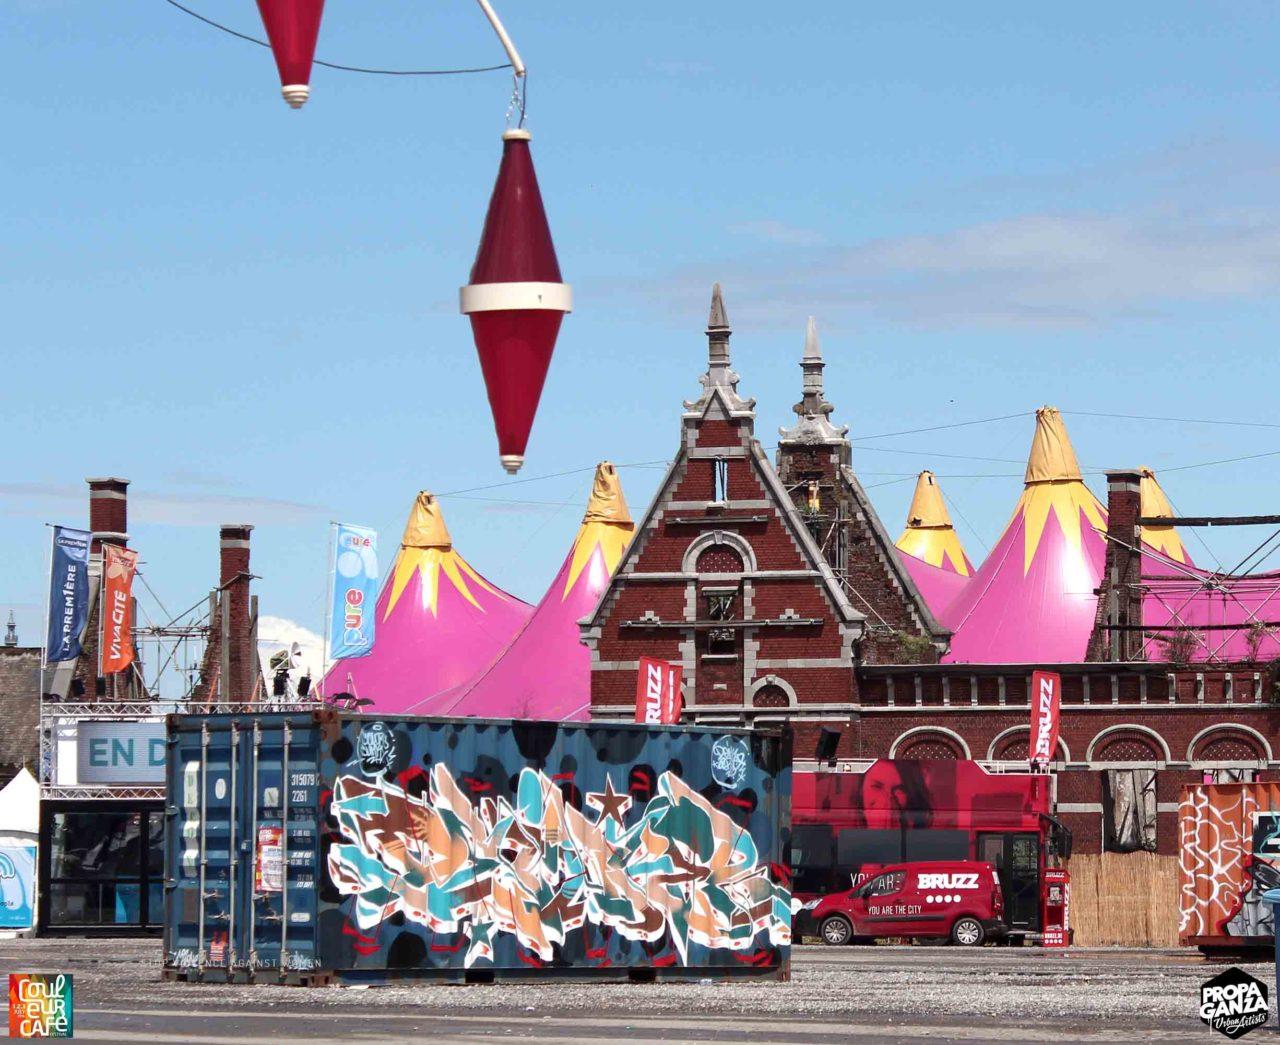 propaganza-artistes-graffiti-street-art-bruxelles-belgique-belgium-painting-spraycan-spraypaint-fresque-couleur-cafe-2016-1280x1045.jpg